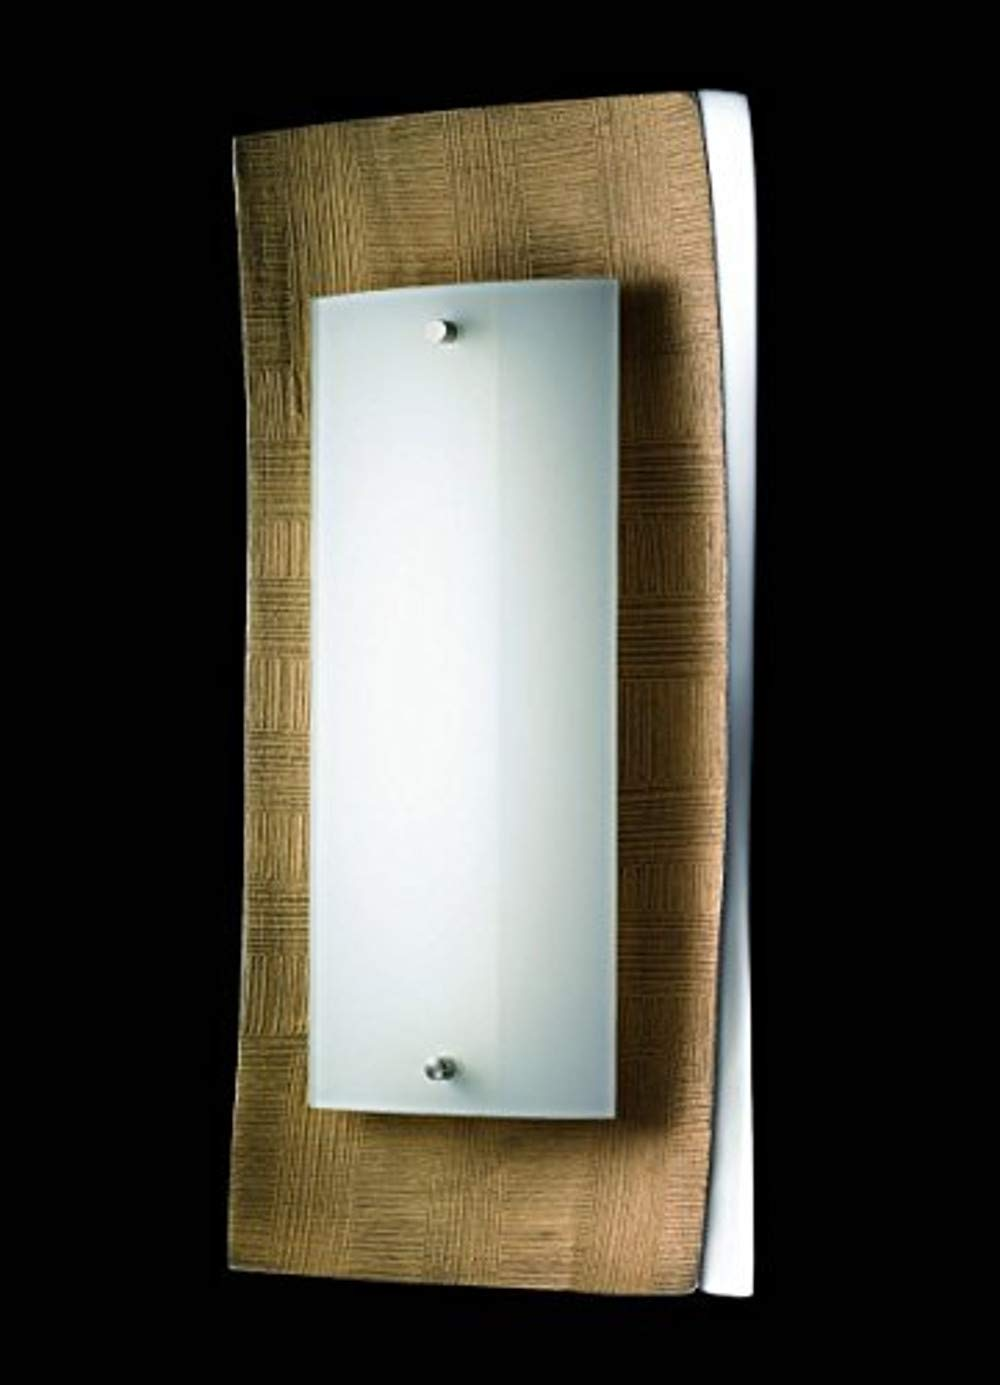 SHINE 51511 A++, Wandleuchte, Glas, goldfarbig/aluminium, 42 x 18,5 x 7,3 cm